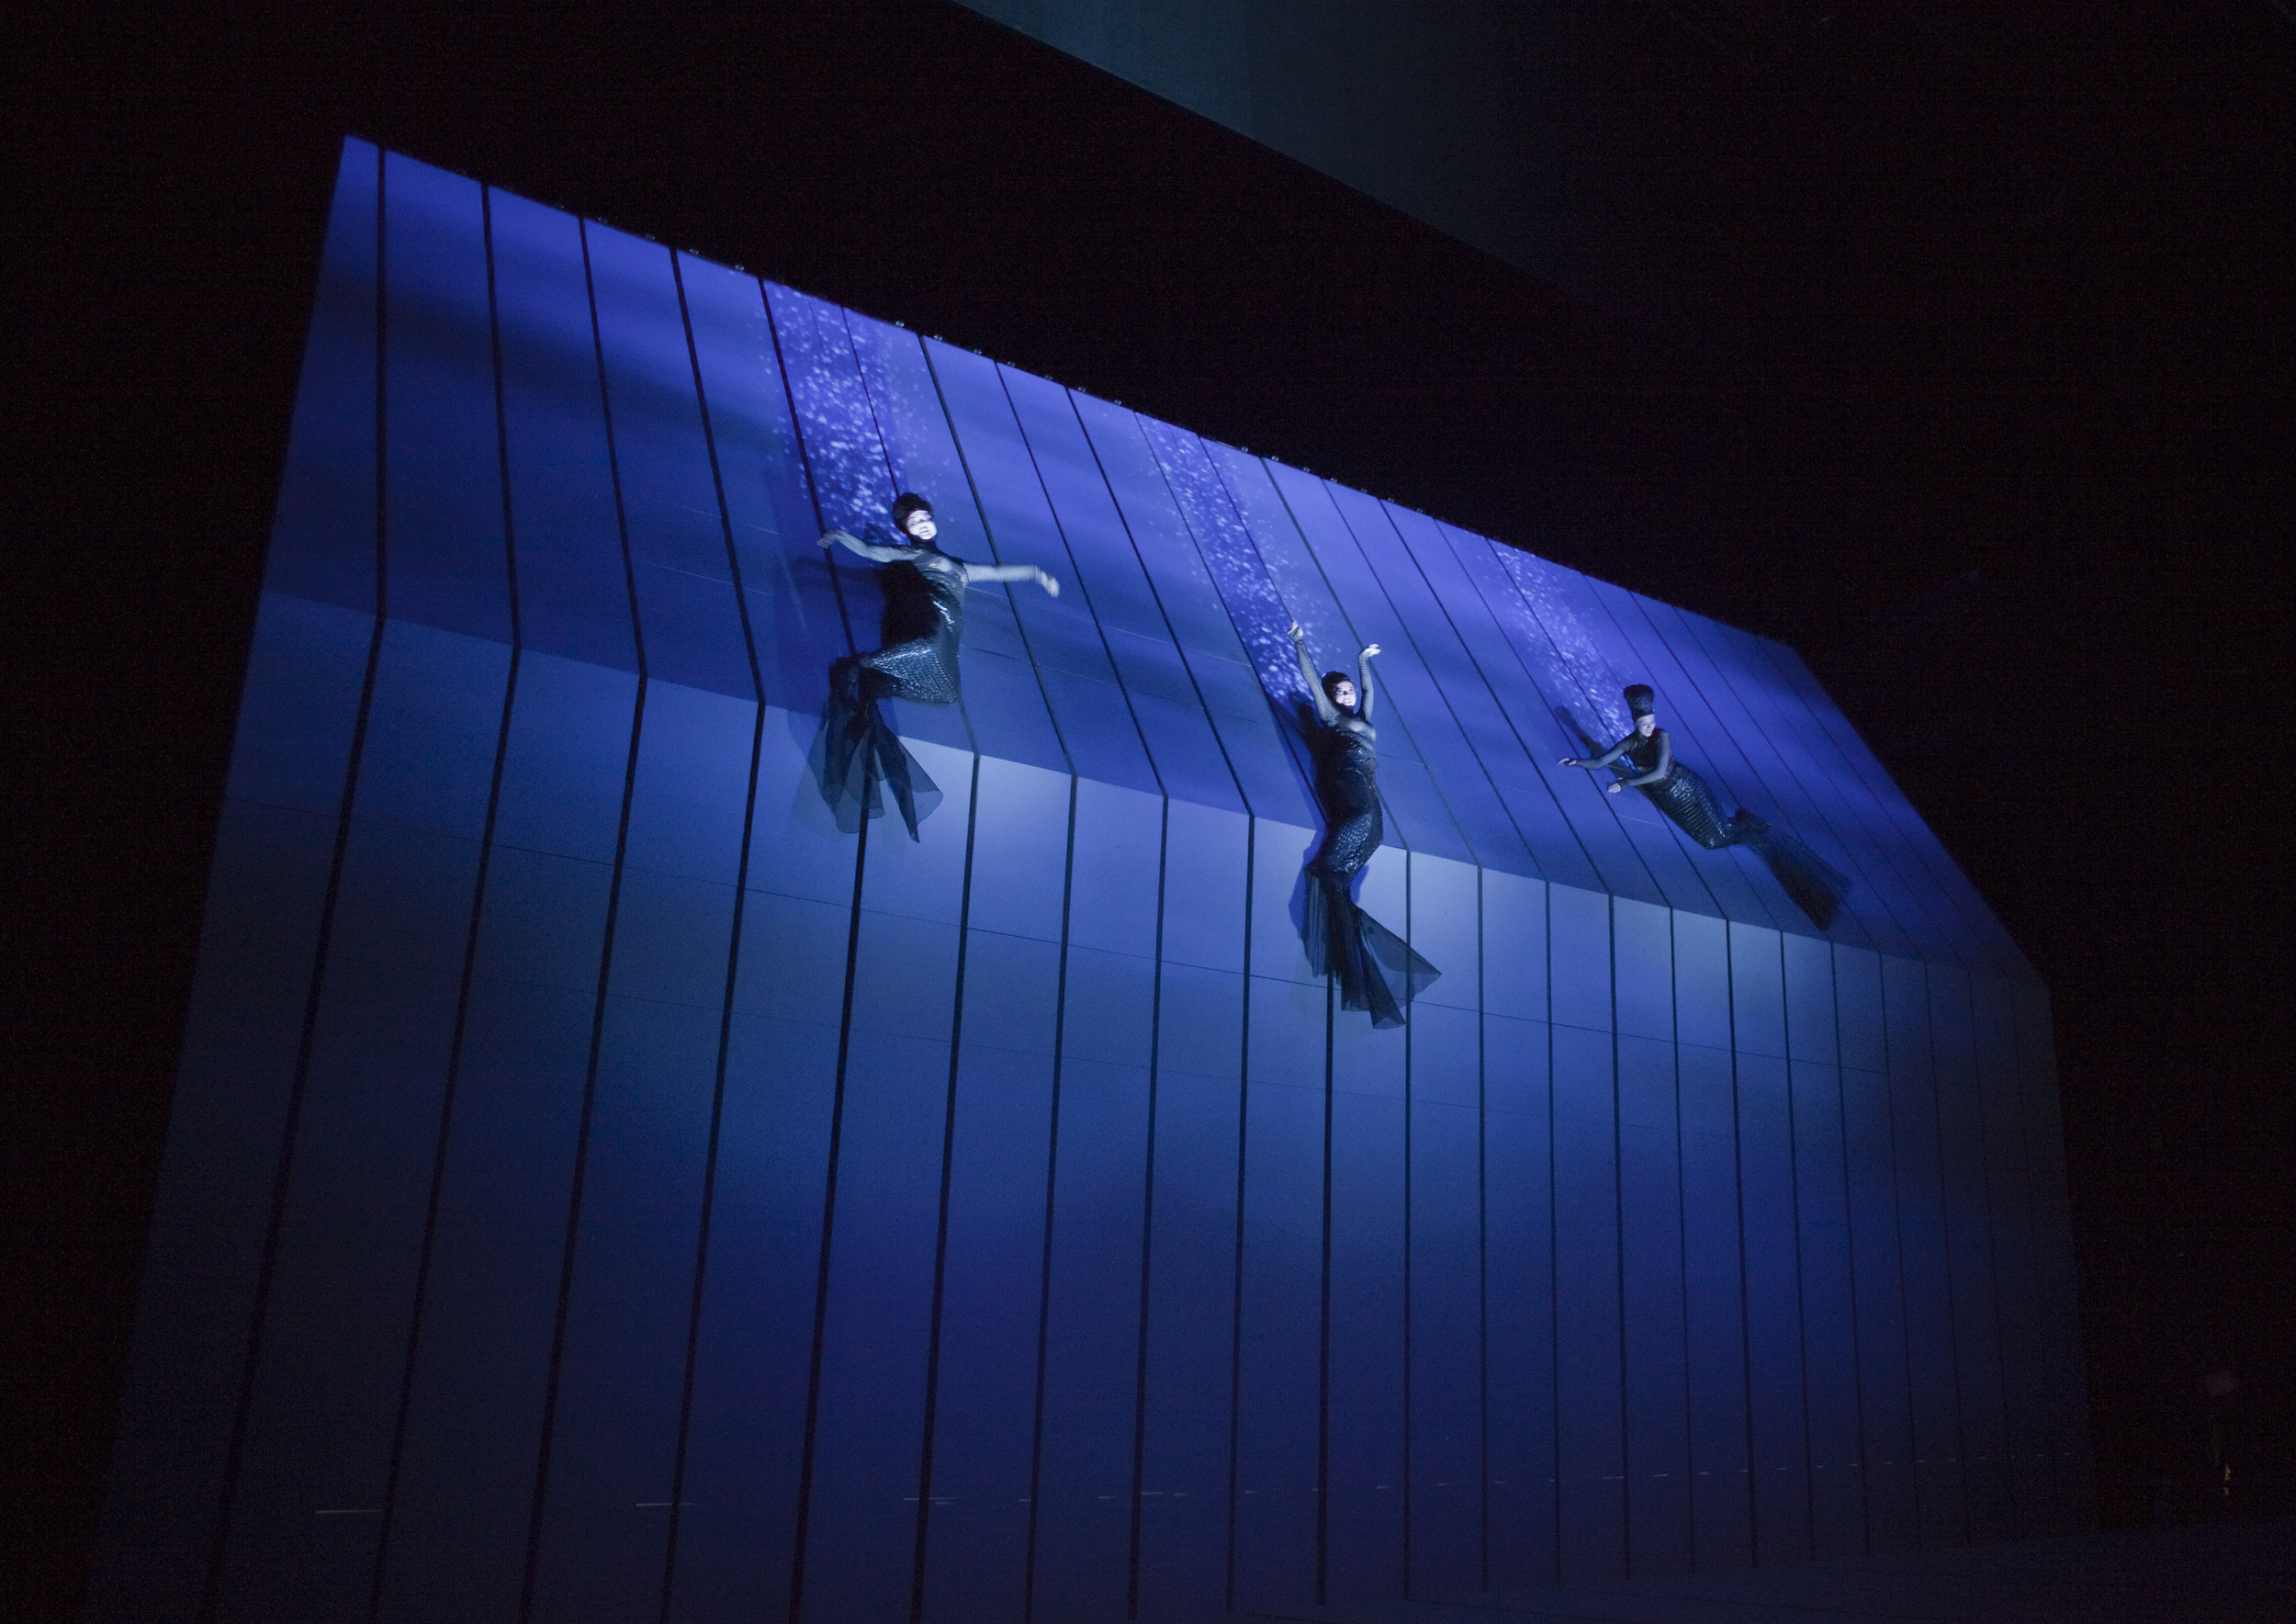 The Rheinmaidens (Jennifer Johnson, Lisette Oropesa, et Tamara Mumford) dans une scèce ne la production de Robert Lepage's de l'opéra de Wagner, Das Rheingold. Photo: Ken Howard/Metropolitan Opera, New York, Septembre 2010